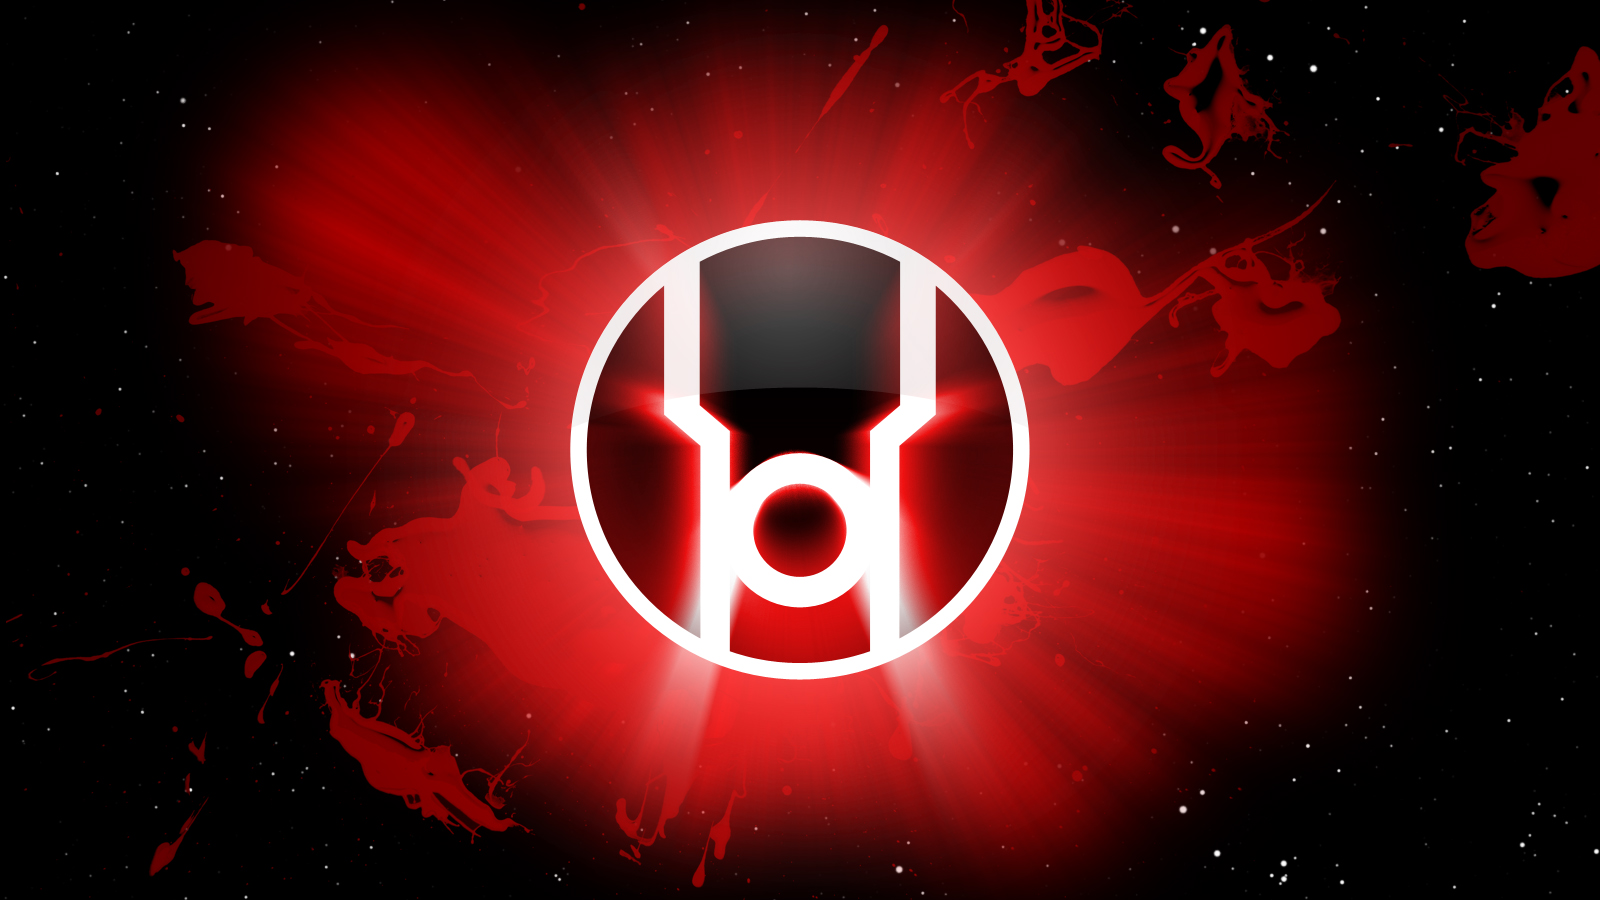 https://1.bp.blogspot.com/-Nu5PSX9M4rA/T7VTDzrSpuI/AAAAAAAAAR8/4JAfRqCTNWc/s1600/Red_Lantern_Corps_Wallpaper_by_Asabru88.jpg